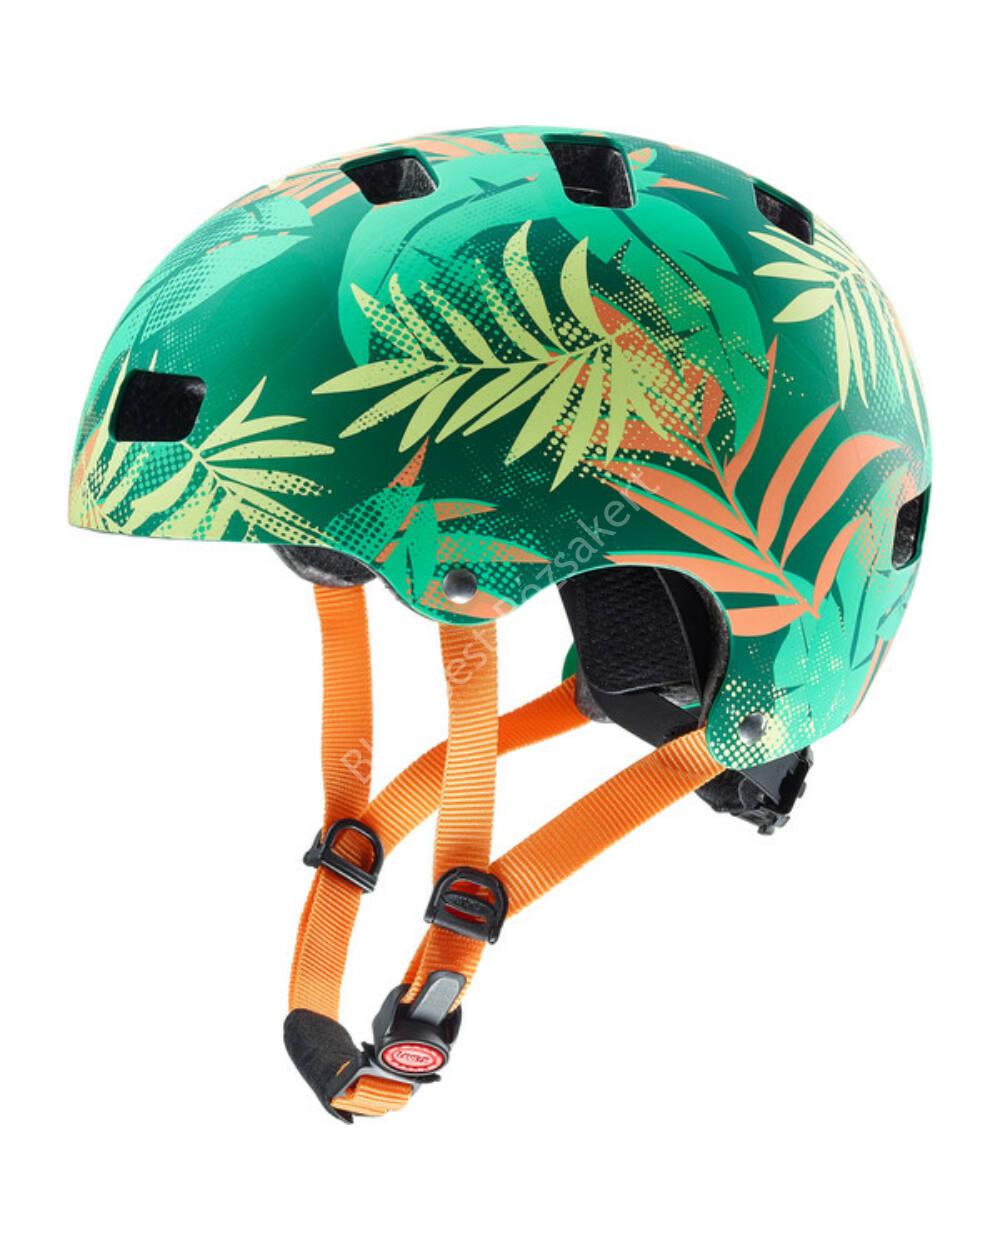 Uvex kid 3 CC dirtbike bukósisak, green-orange, 51-55 cm